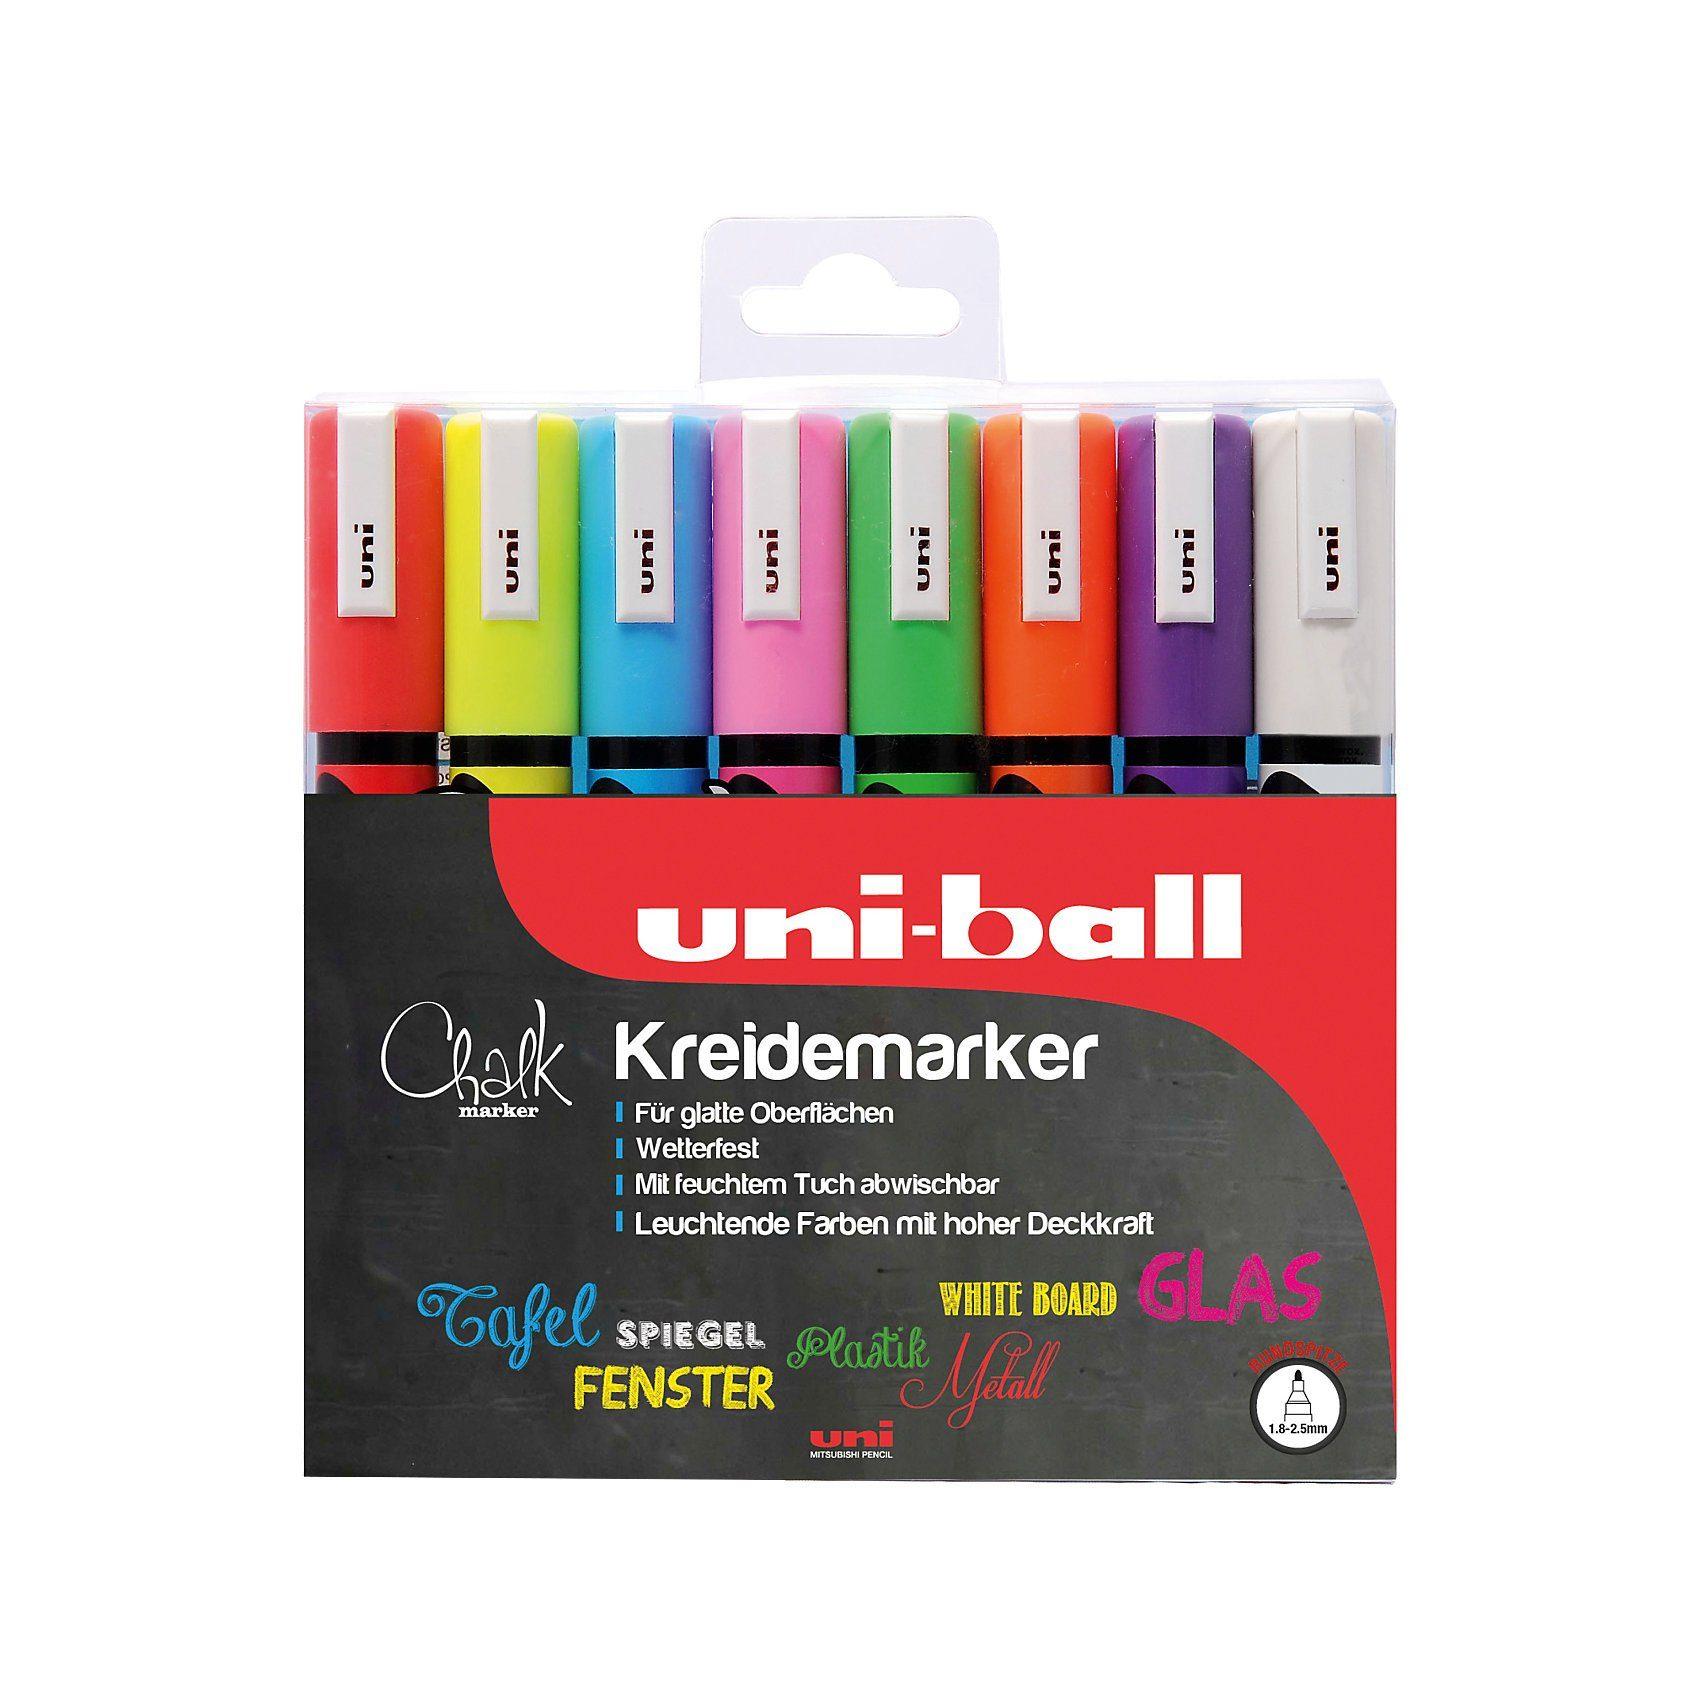 uni-ball UNI Chalk Kreidemarker 1,8-2,5 mm, 8 Farben